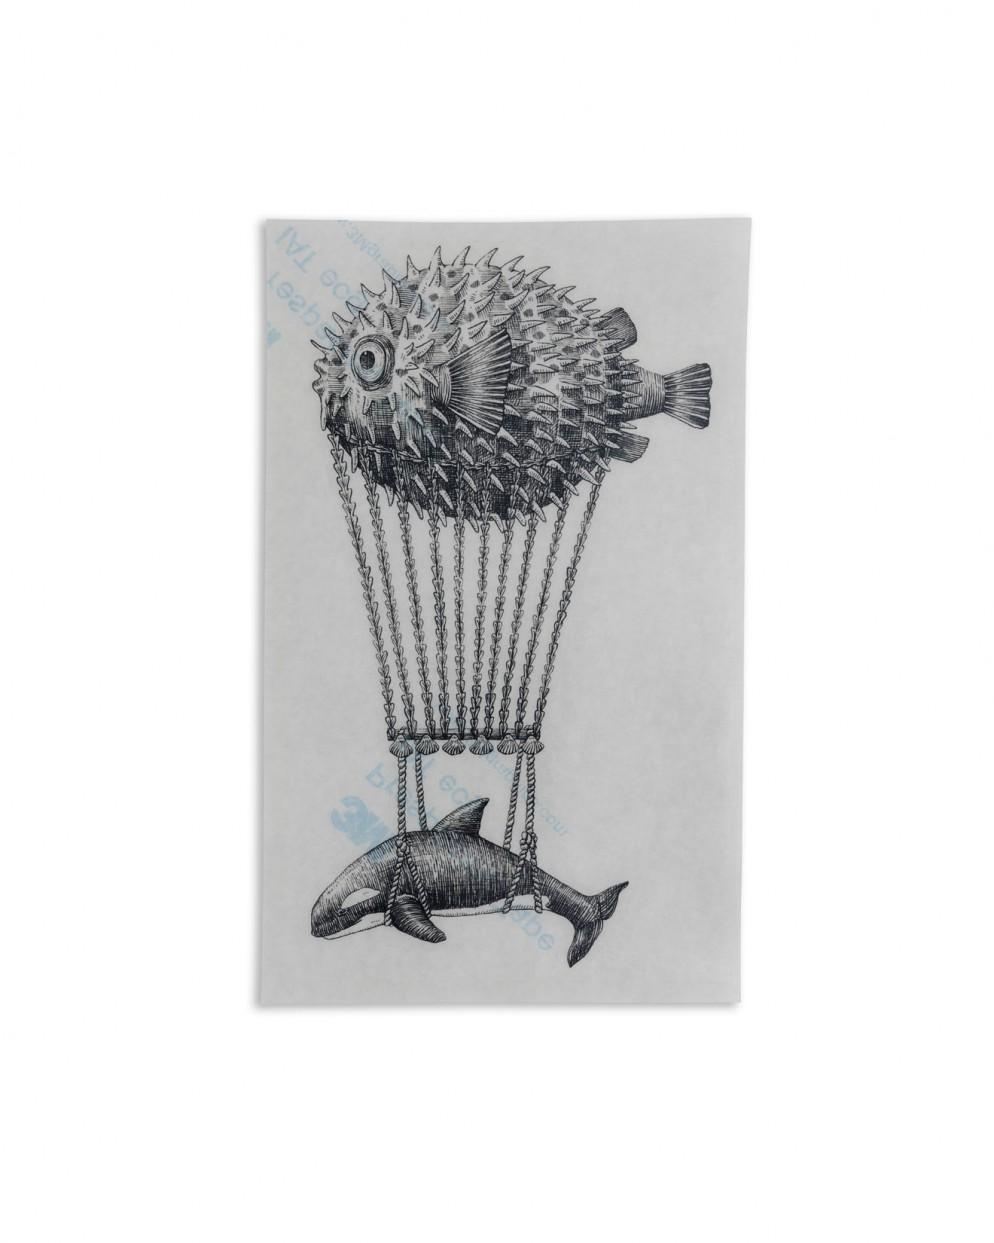 collezione-stickers-notebook-piatti-aquatic-creatures-14